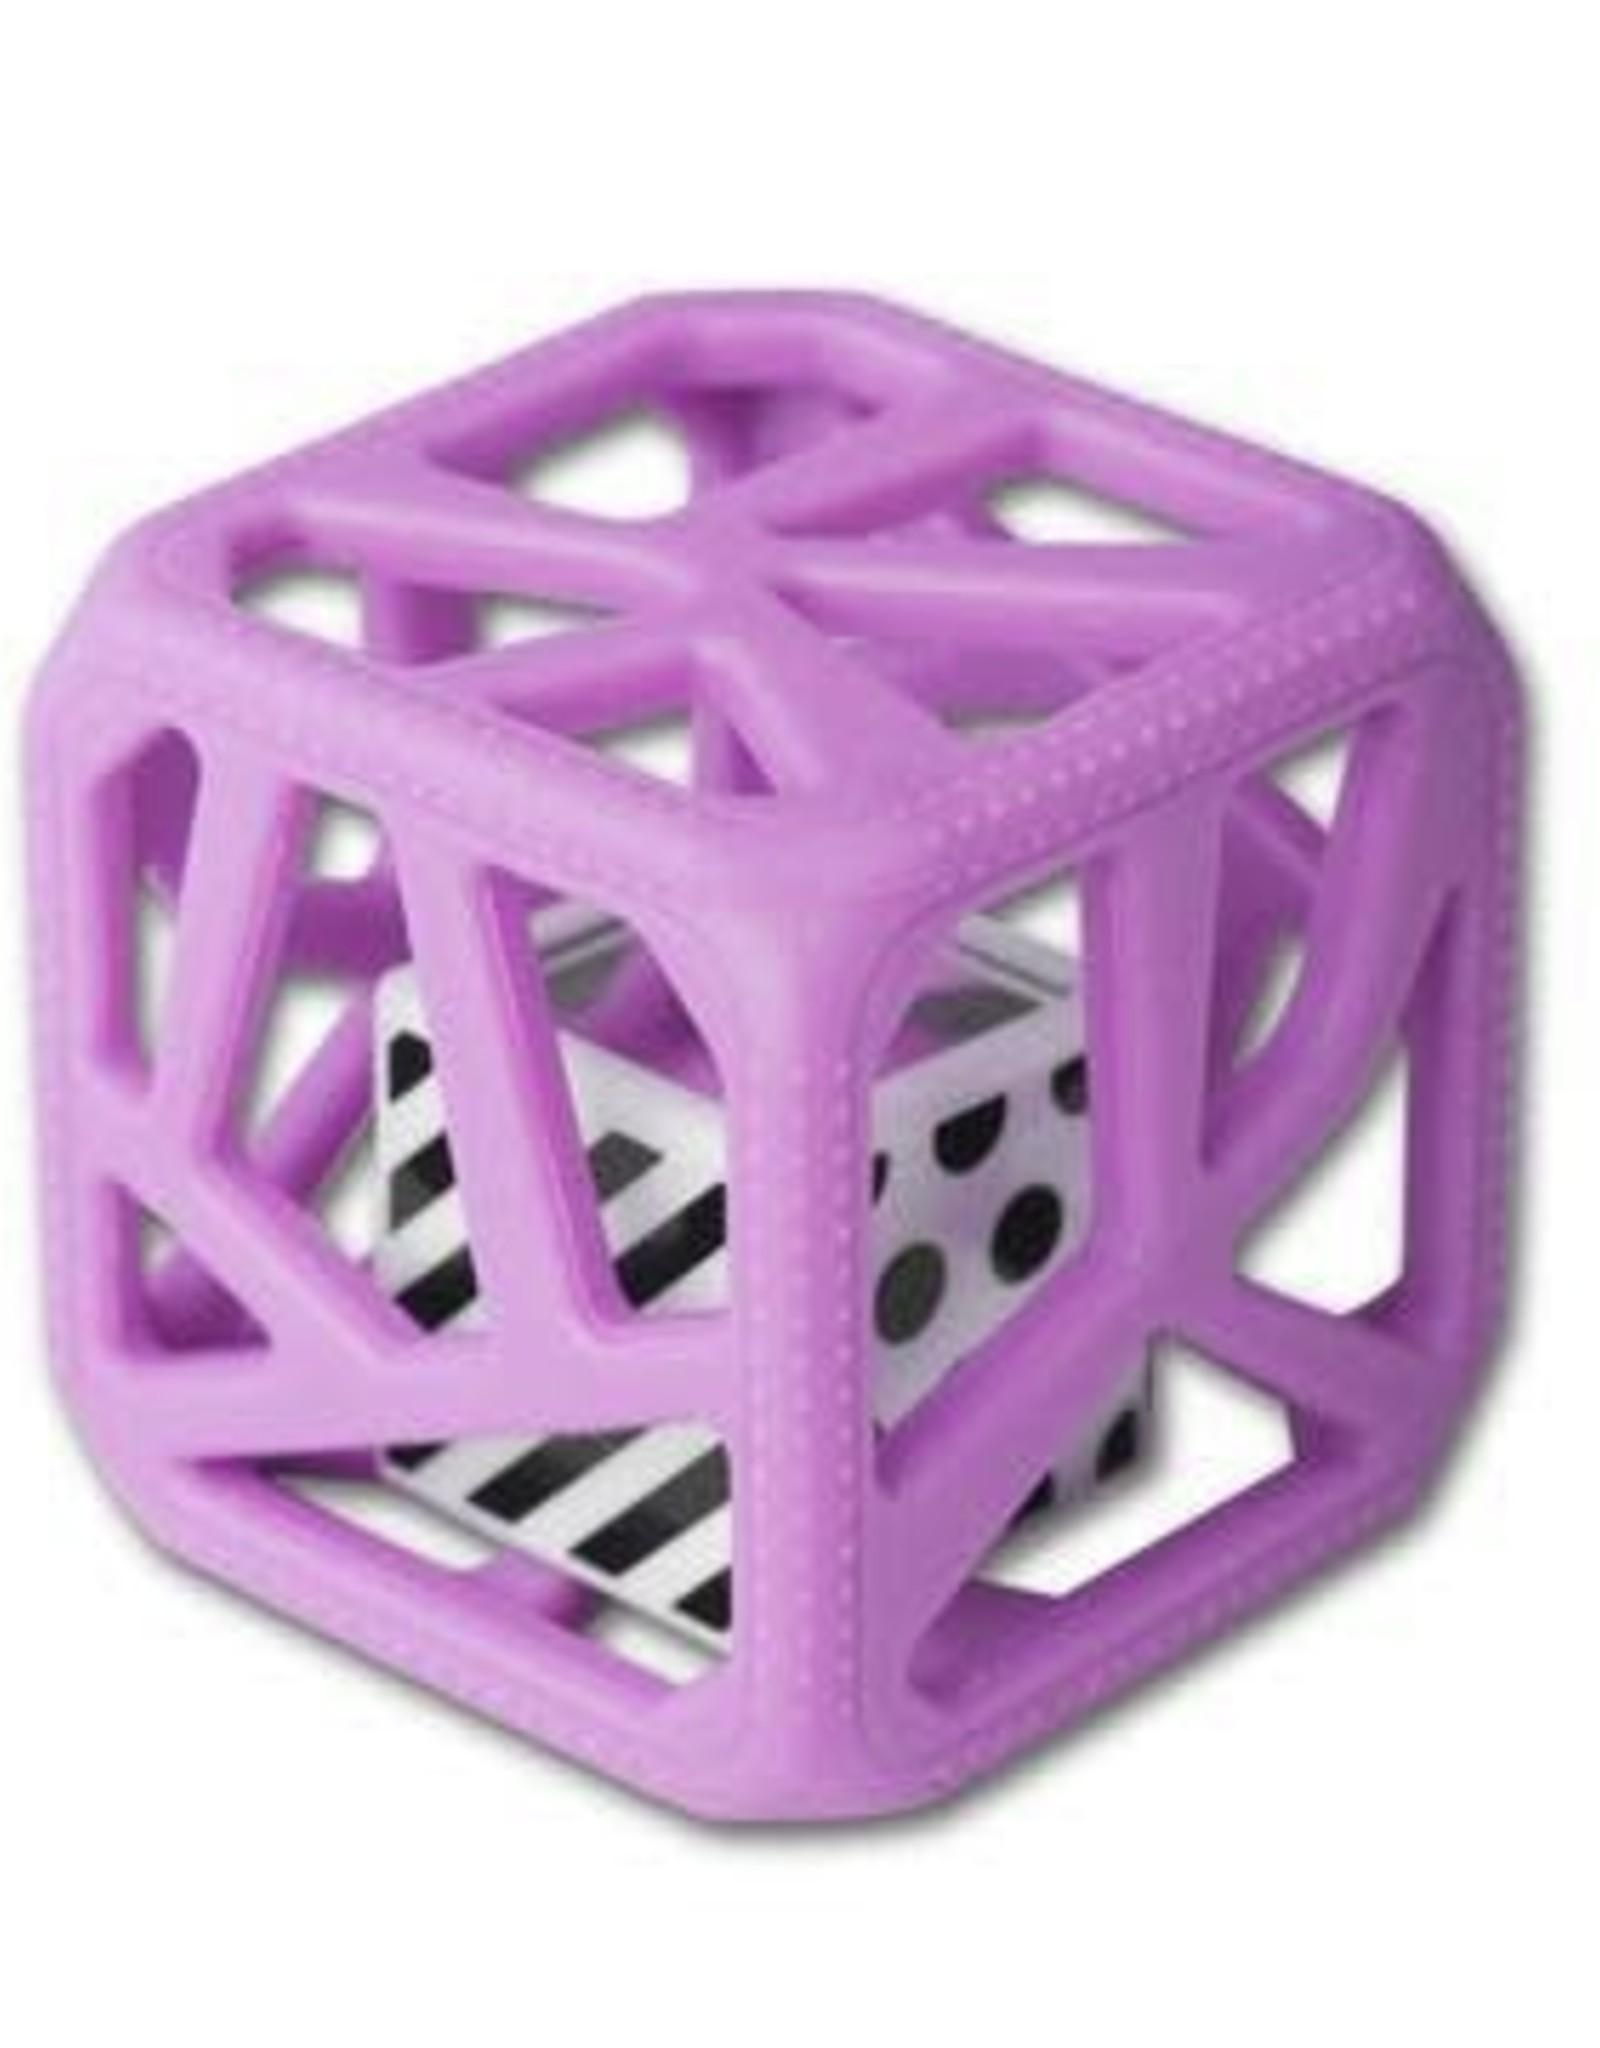 Malarkey Kids Malarkey Kids Chew Cube - Purple